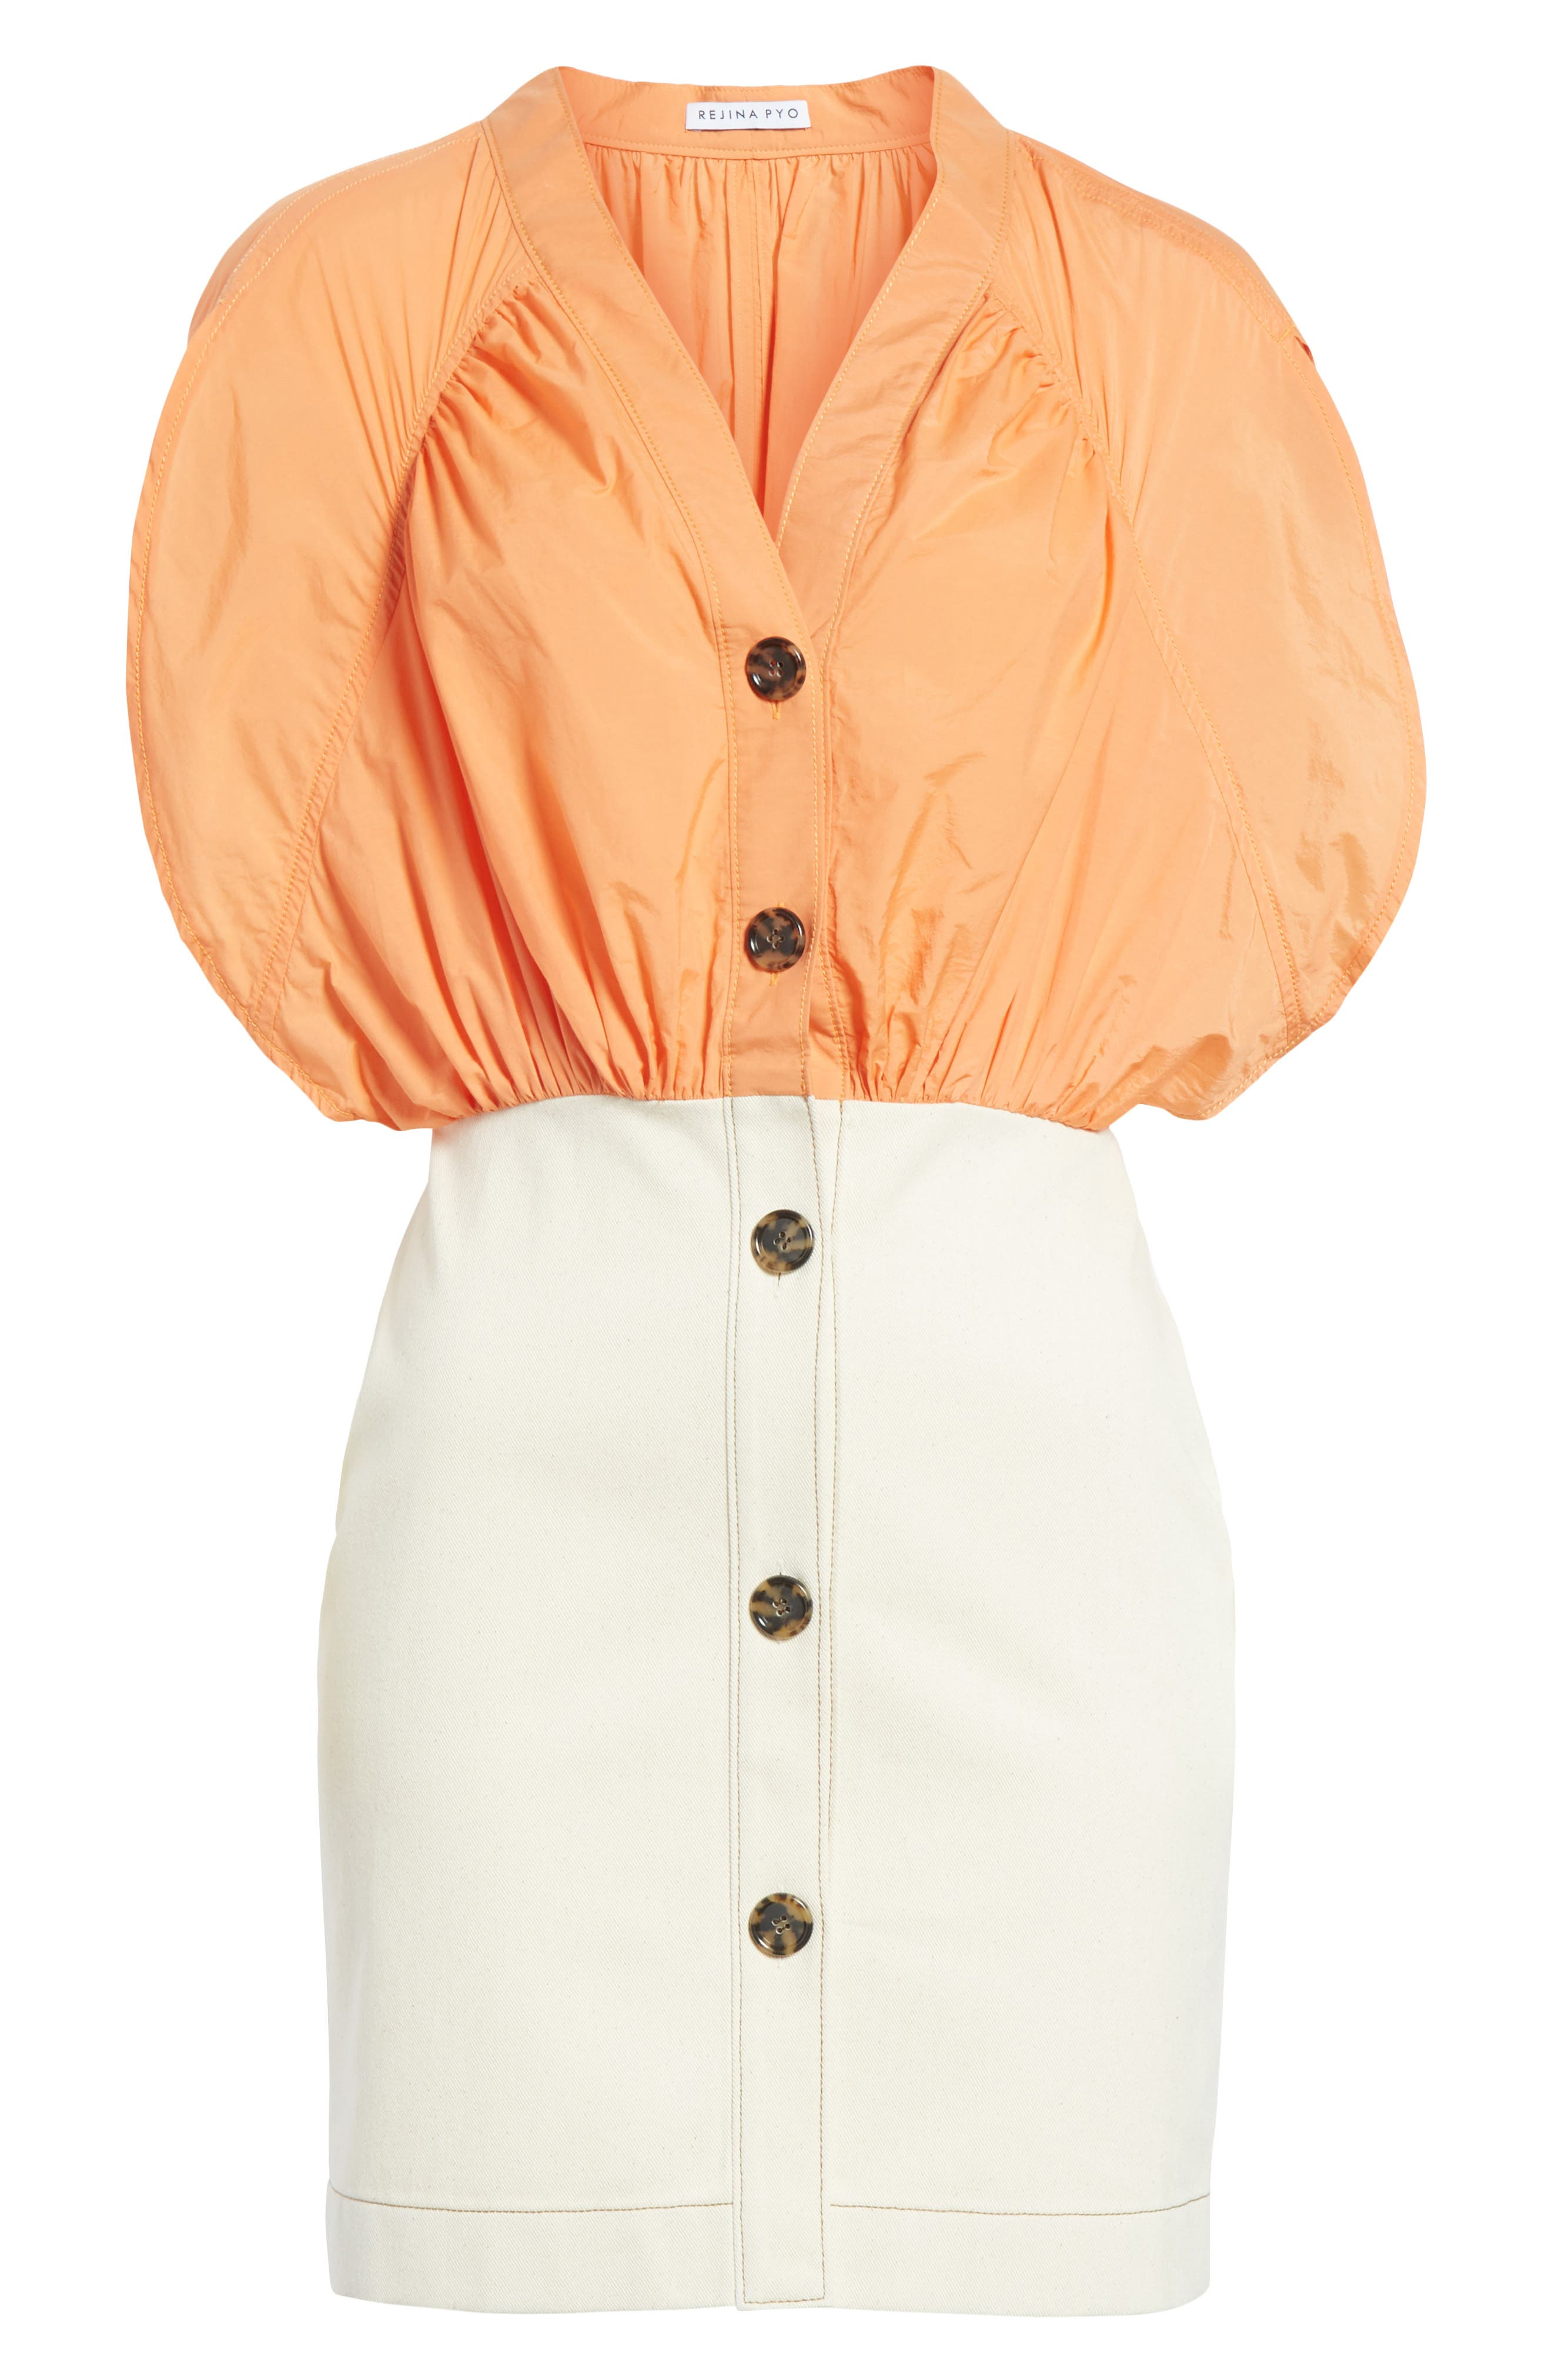 Yana Bicolor Dress,                             Alternate thumbnail 6, color,                             Cotton Orange/ Denim Ecru